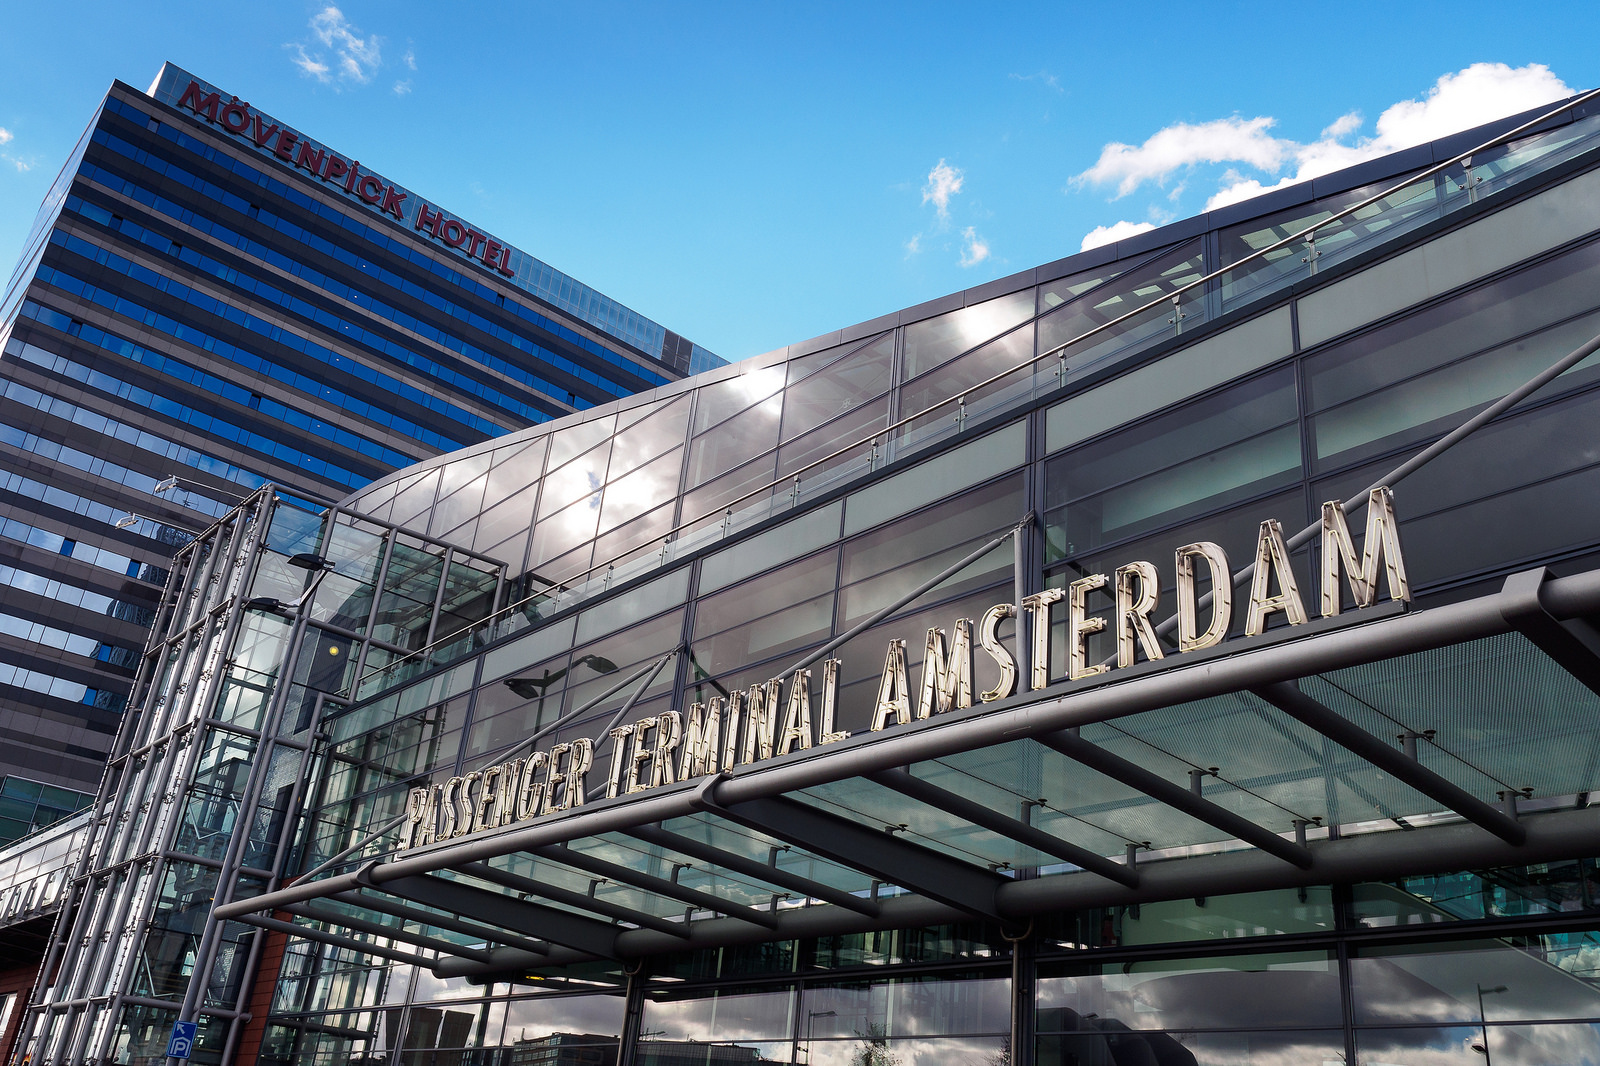 Passenger Terminal, Amsterdam